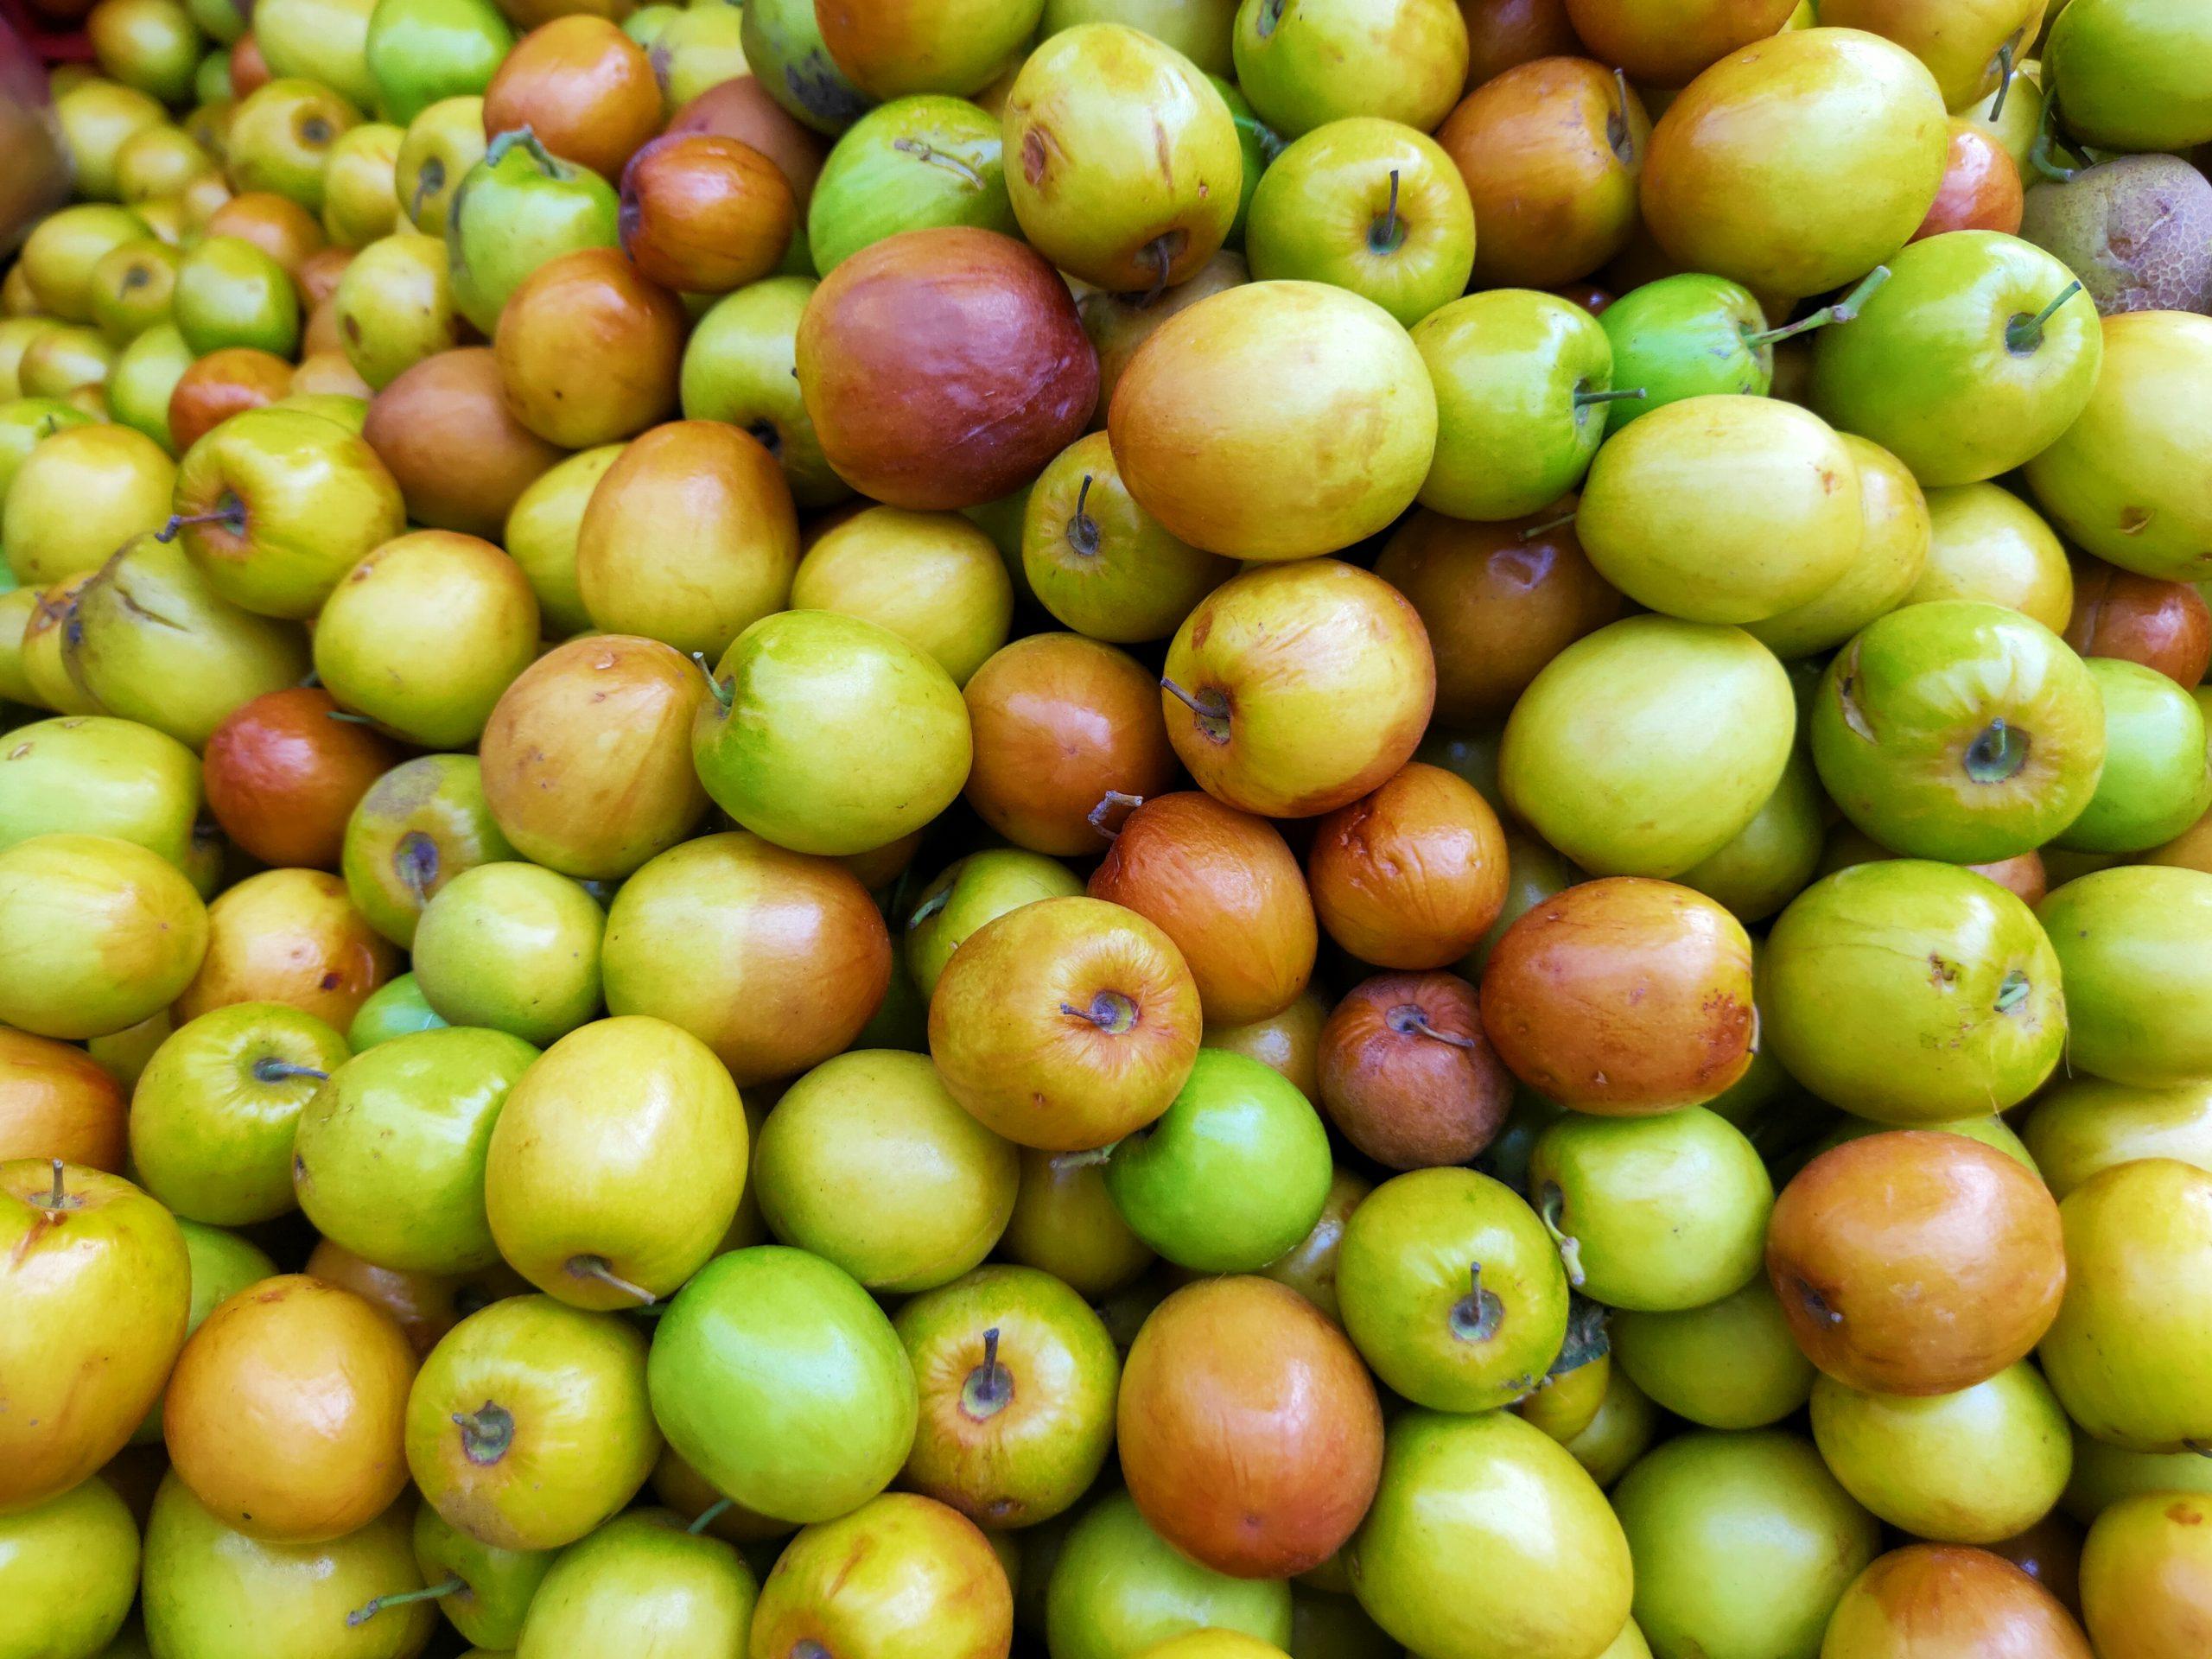 A heap of jujube fruits